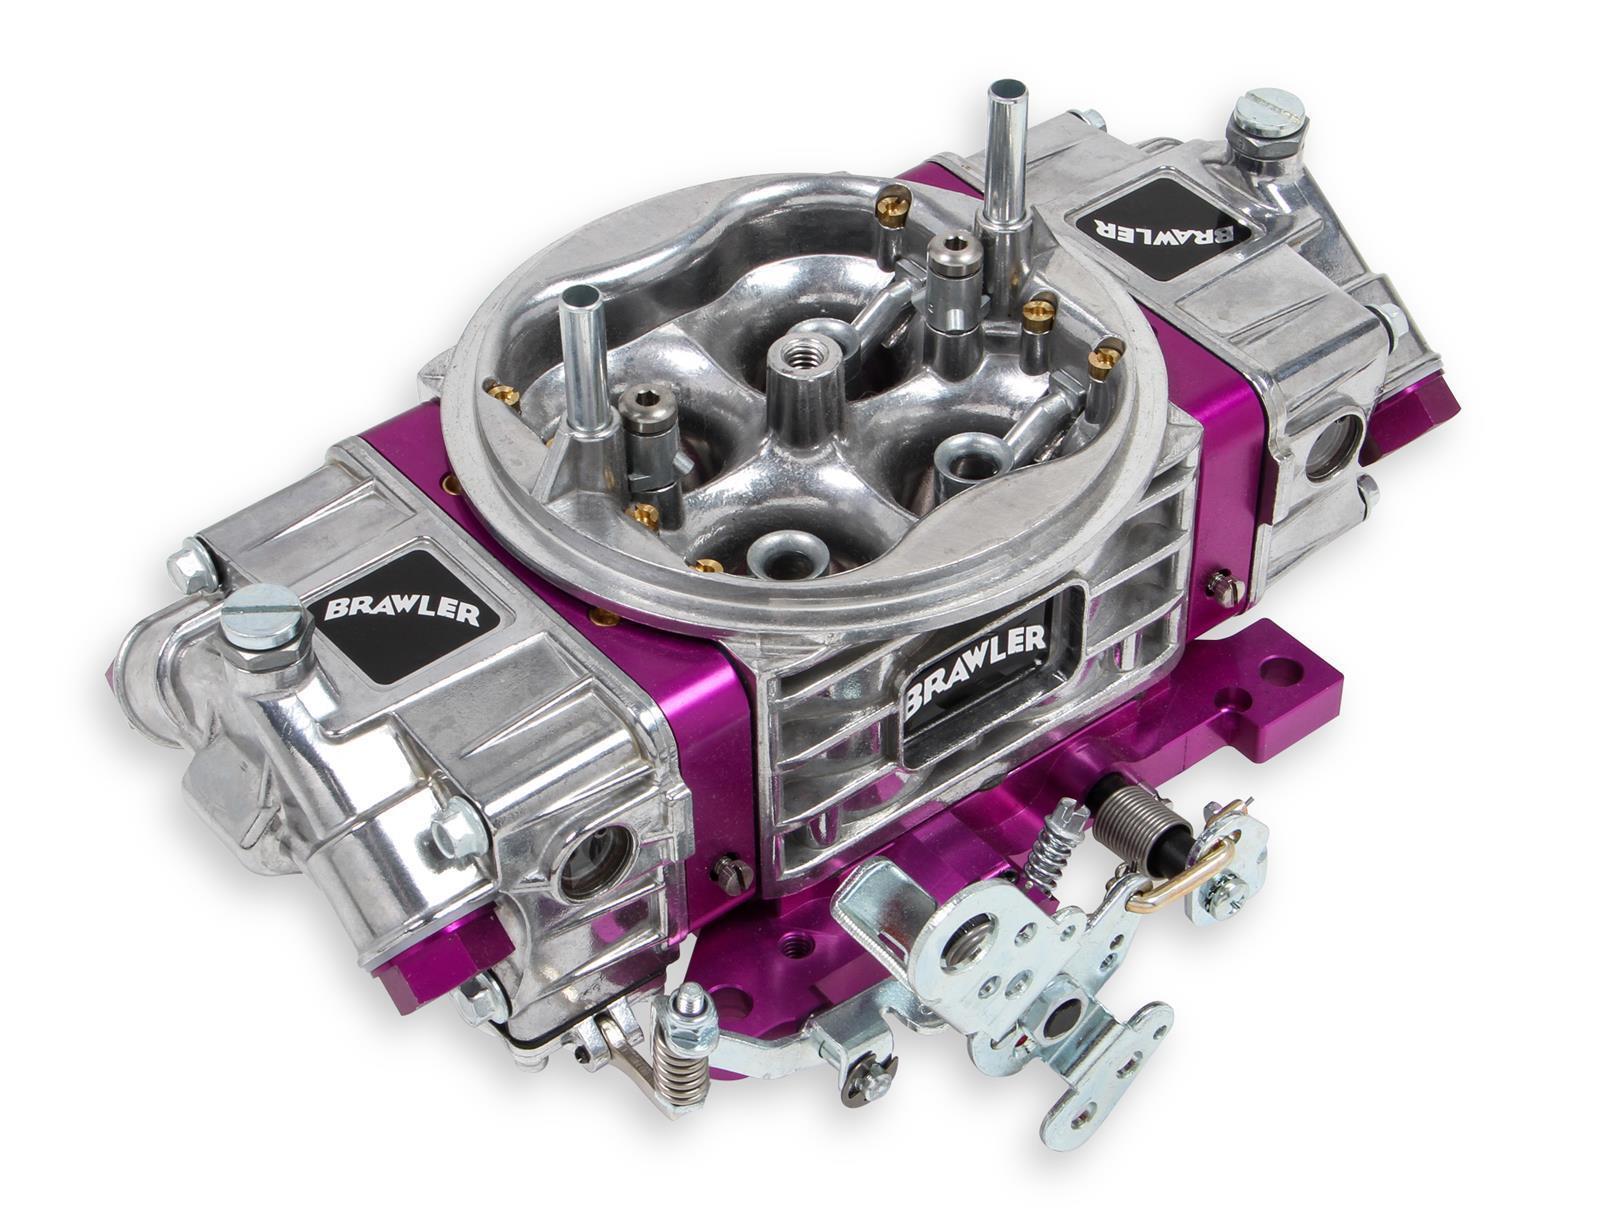 Proform 67211 Street Series 600 CFM Polished Aluminum Dual Inlet 4-Barrel Square Bore Mechanical Secondary Carburetor with Electric Choke